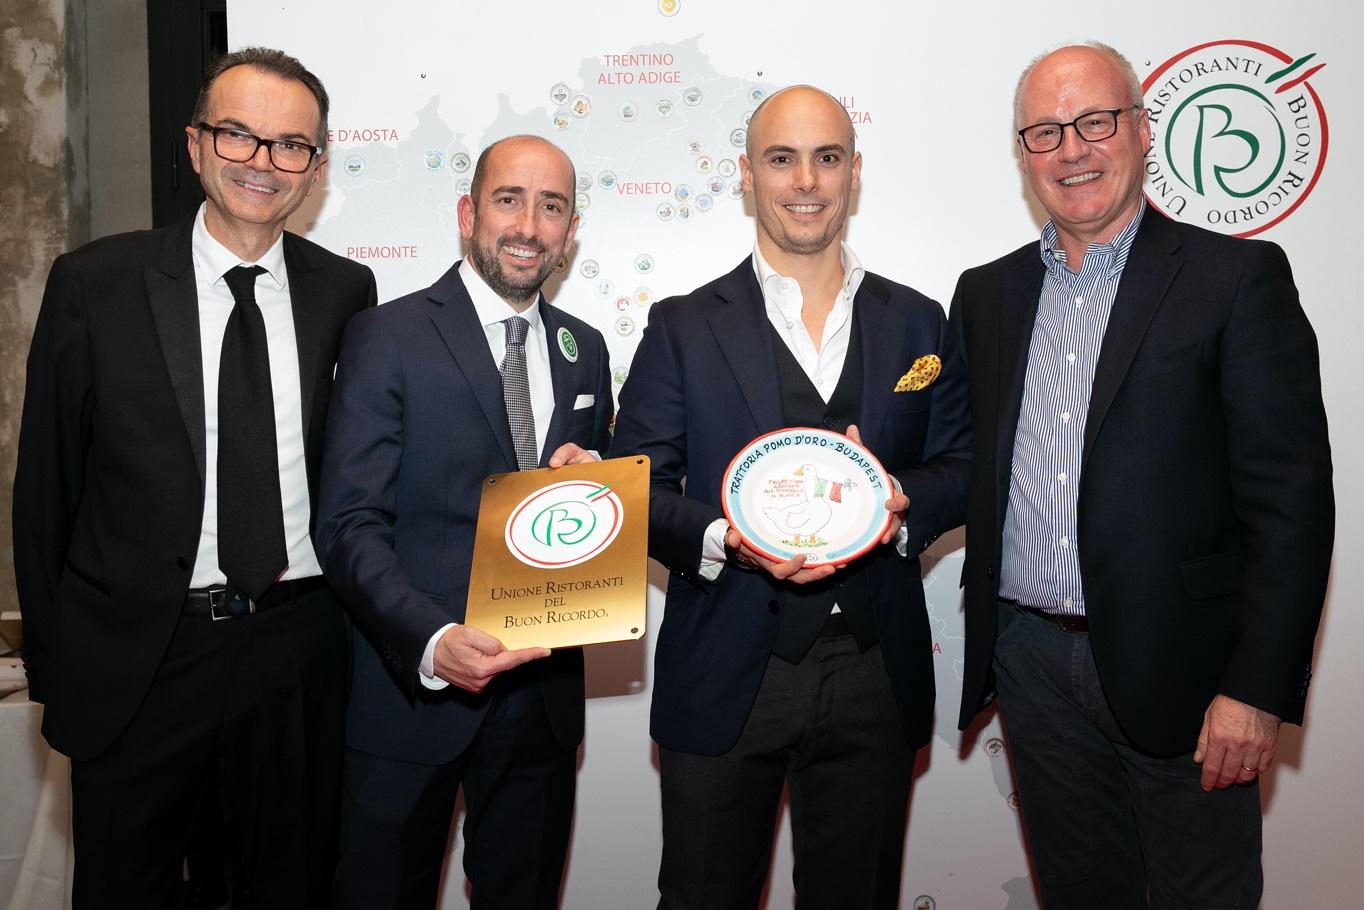 A Trattoria Pomo d'Oro Boun Ricordo tányérját Paolo Tommasi tartja a kezében